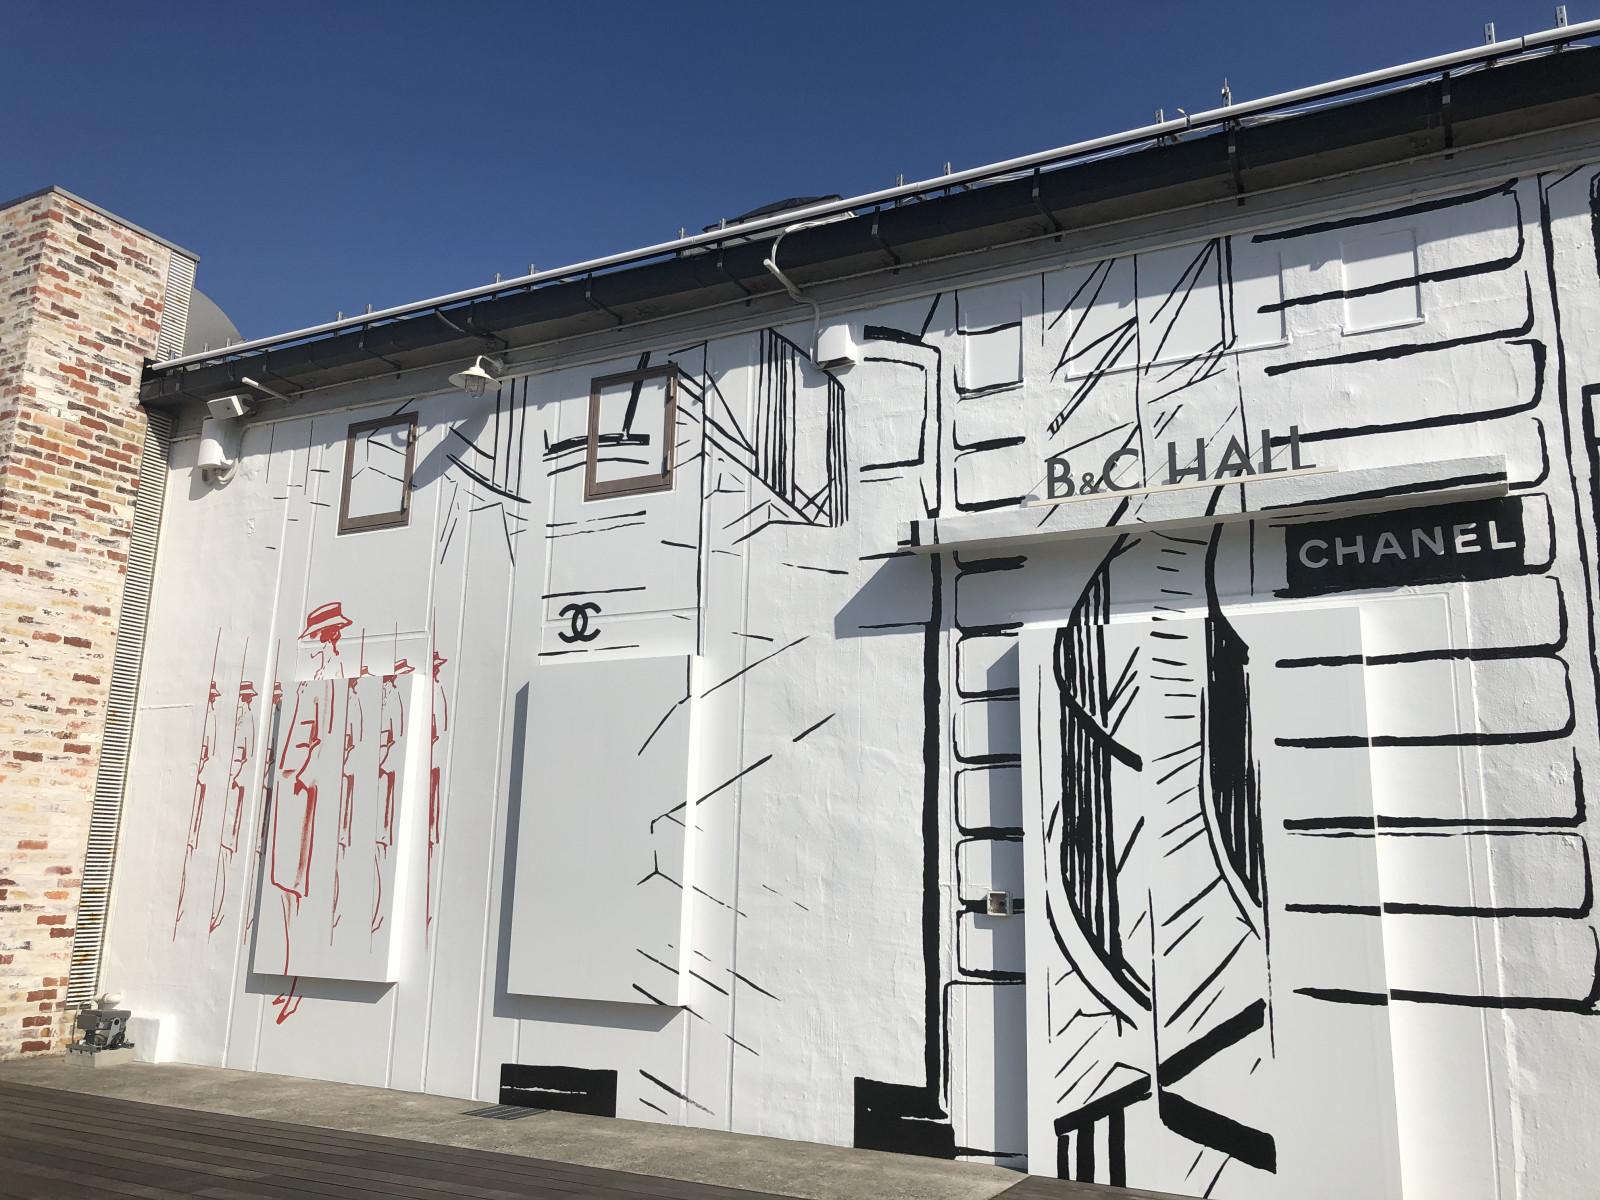 【CHANELマドモアゼルプリヴェ展へ】シャネルの赤リップとヘレナのマスカラでドラマティックメイク